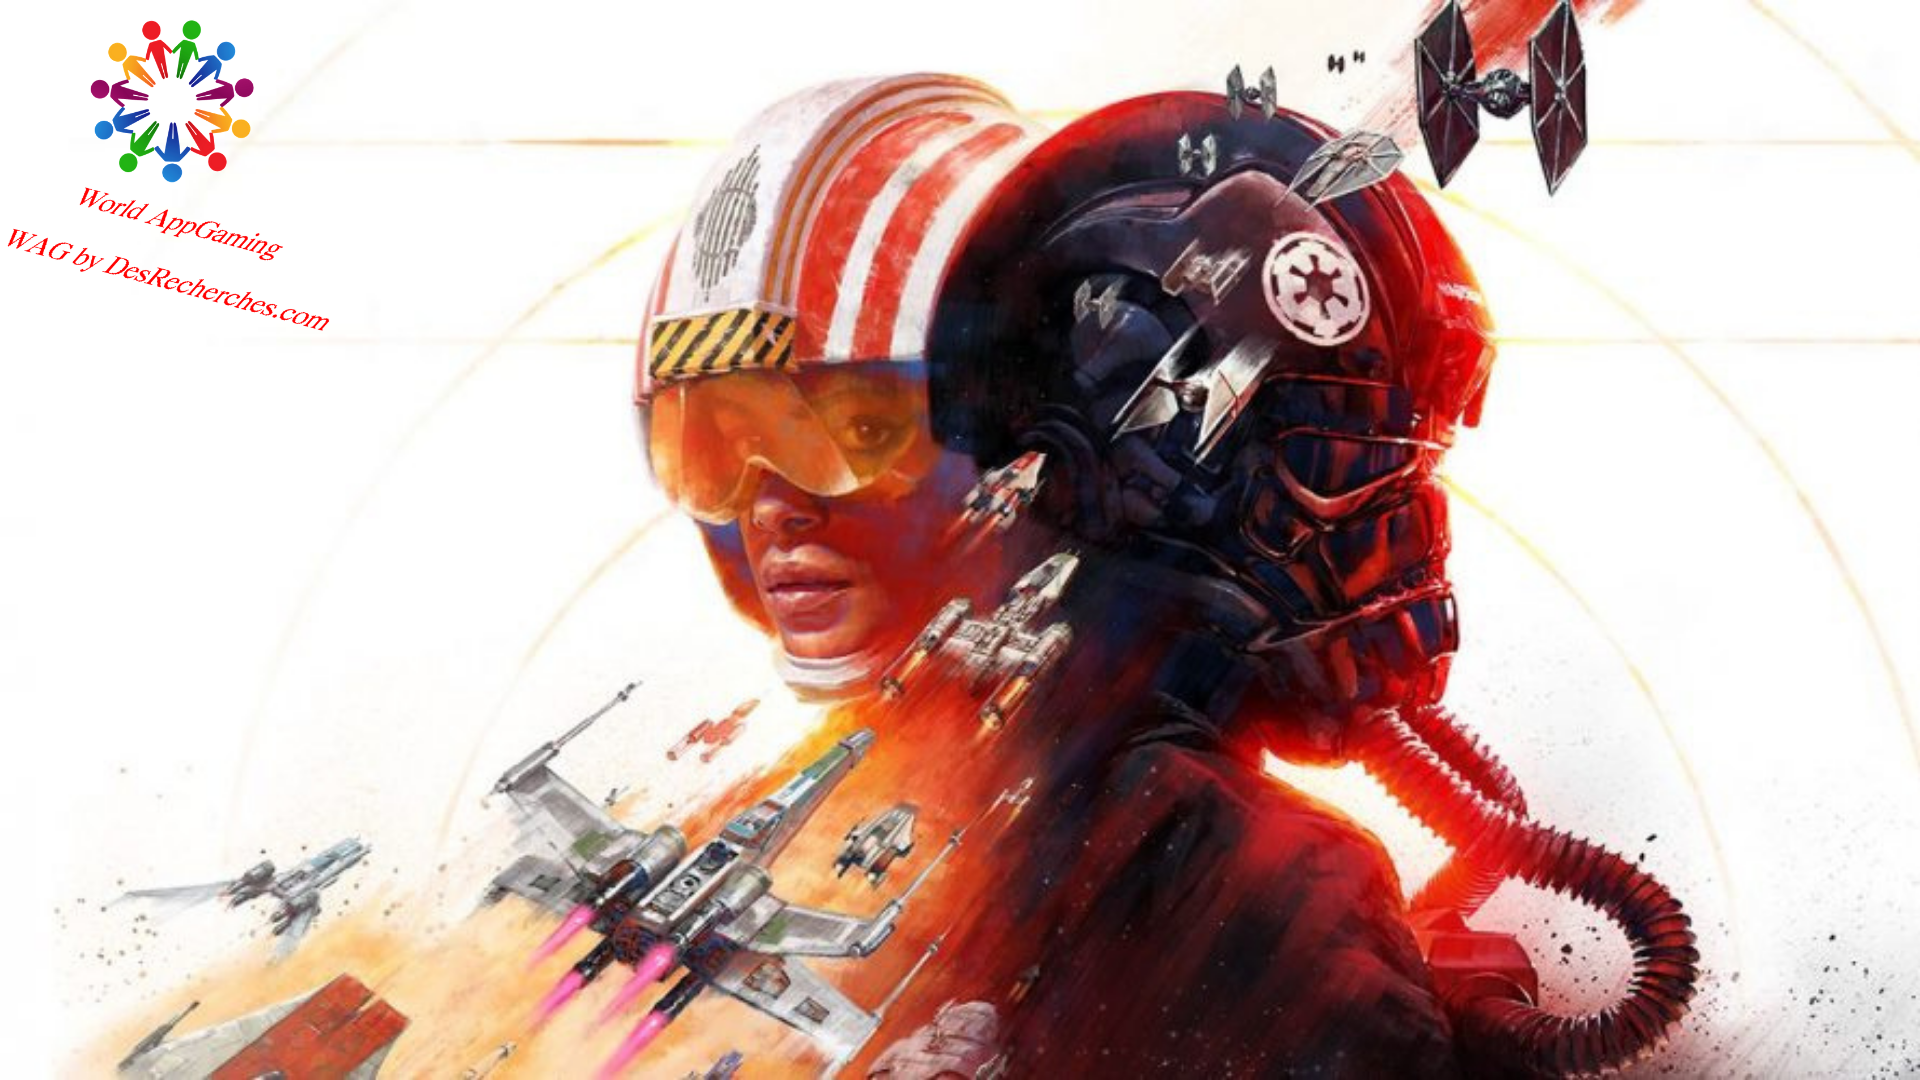 Fond d'écran (WAG by desrecherches.com) Star Wars - 1